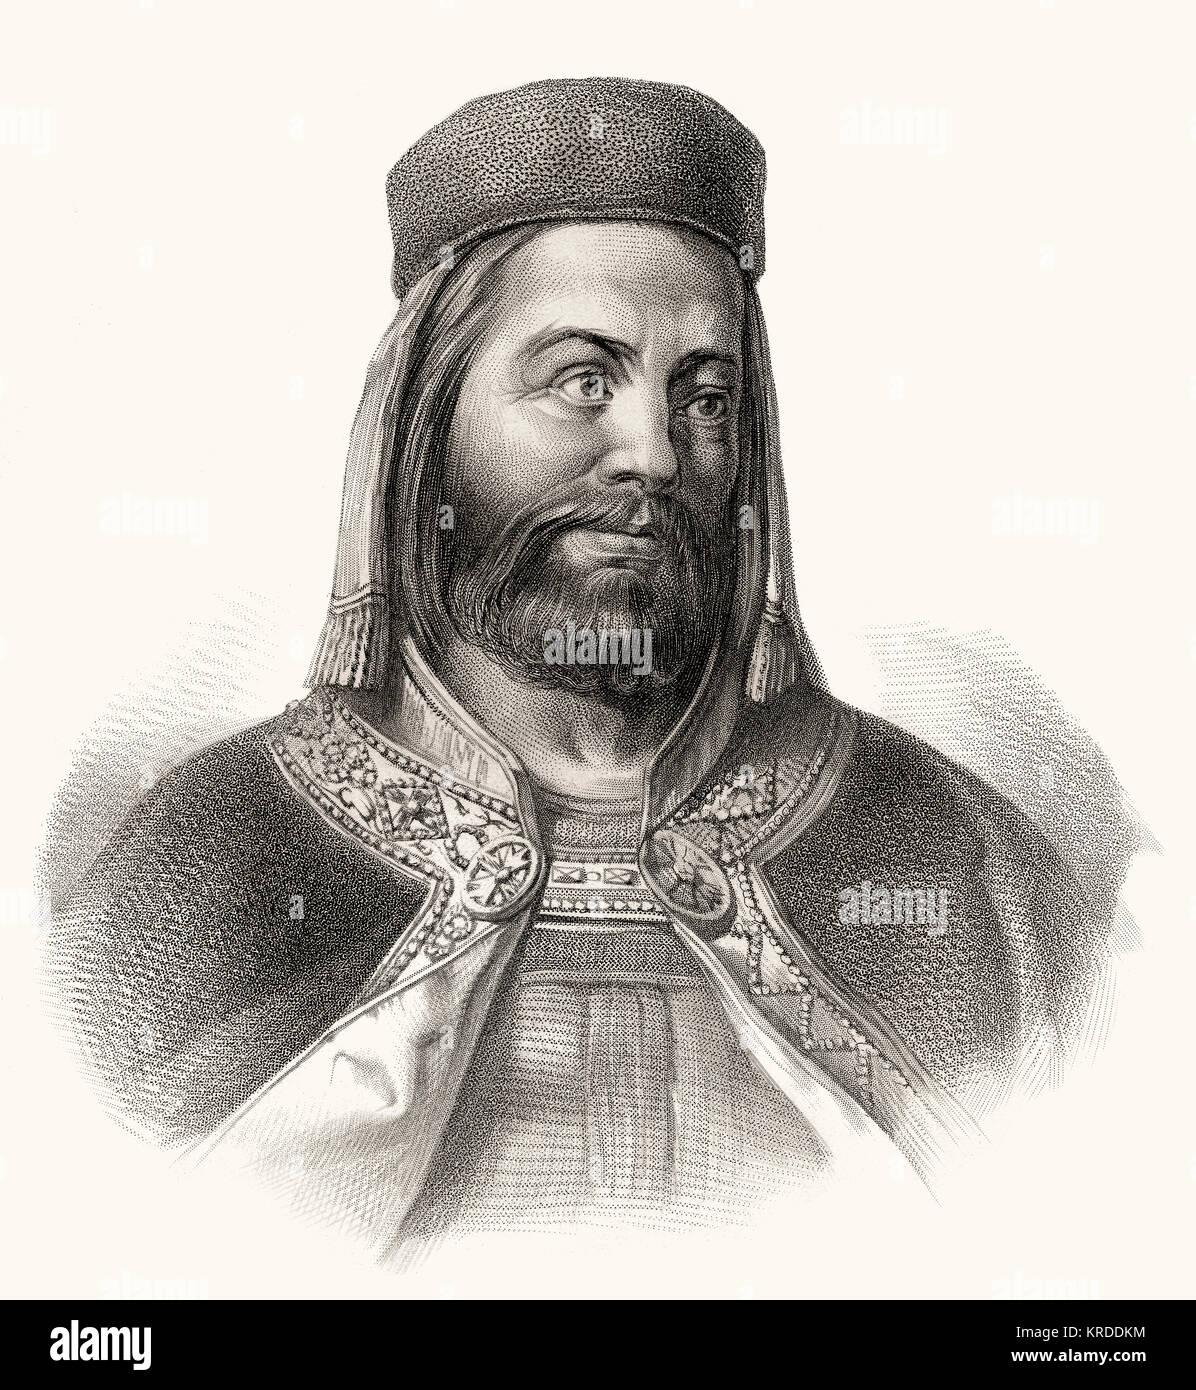 Charles IV,  1316 - 1378,  king of Bohemia, Holy Roman Emperor - Stock Image